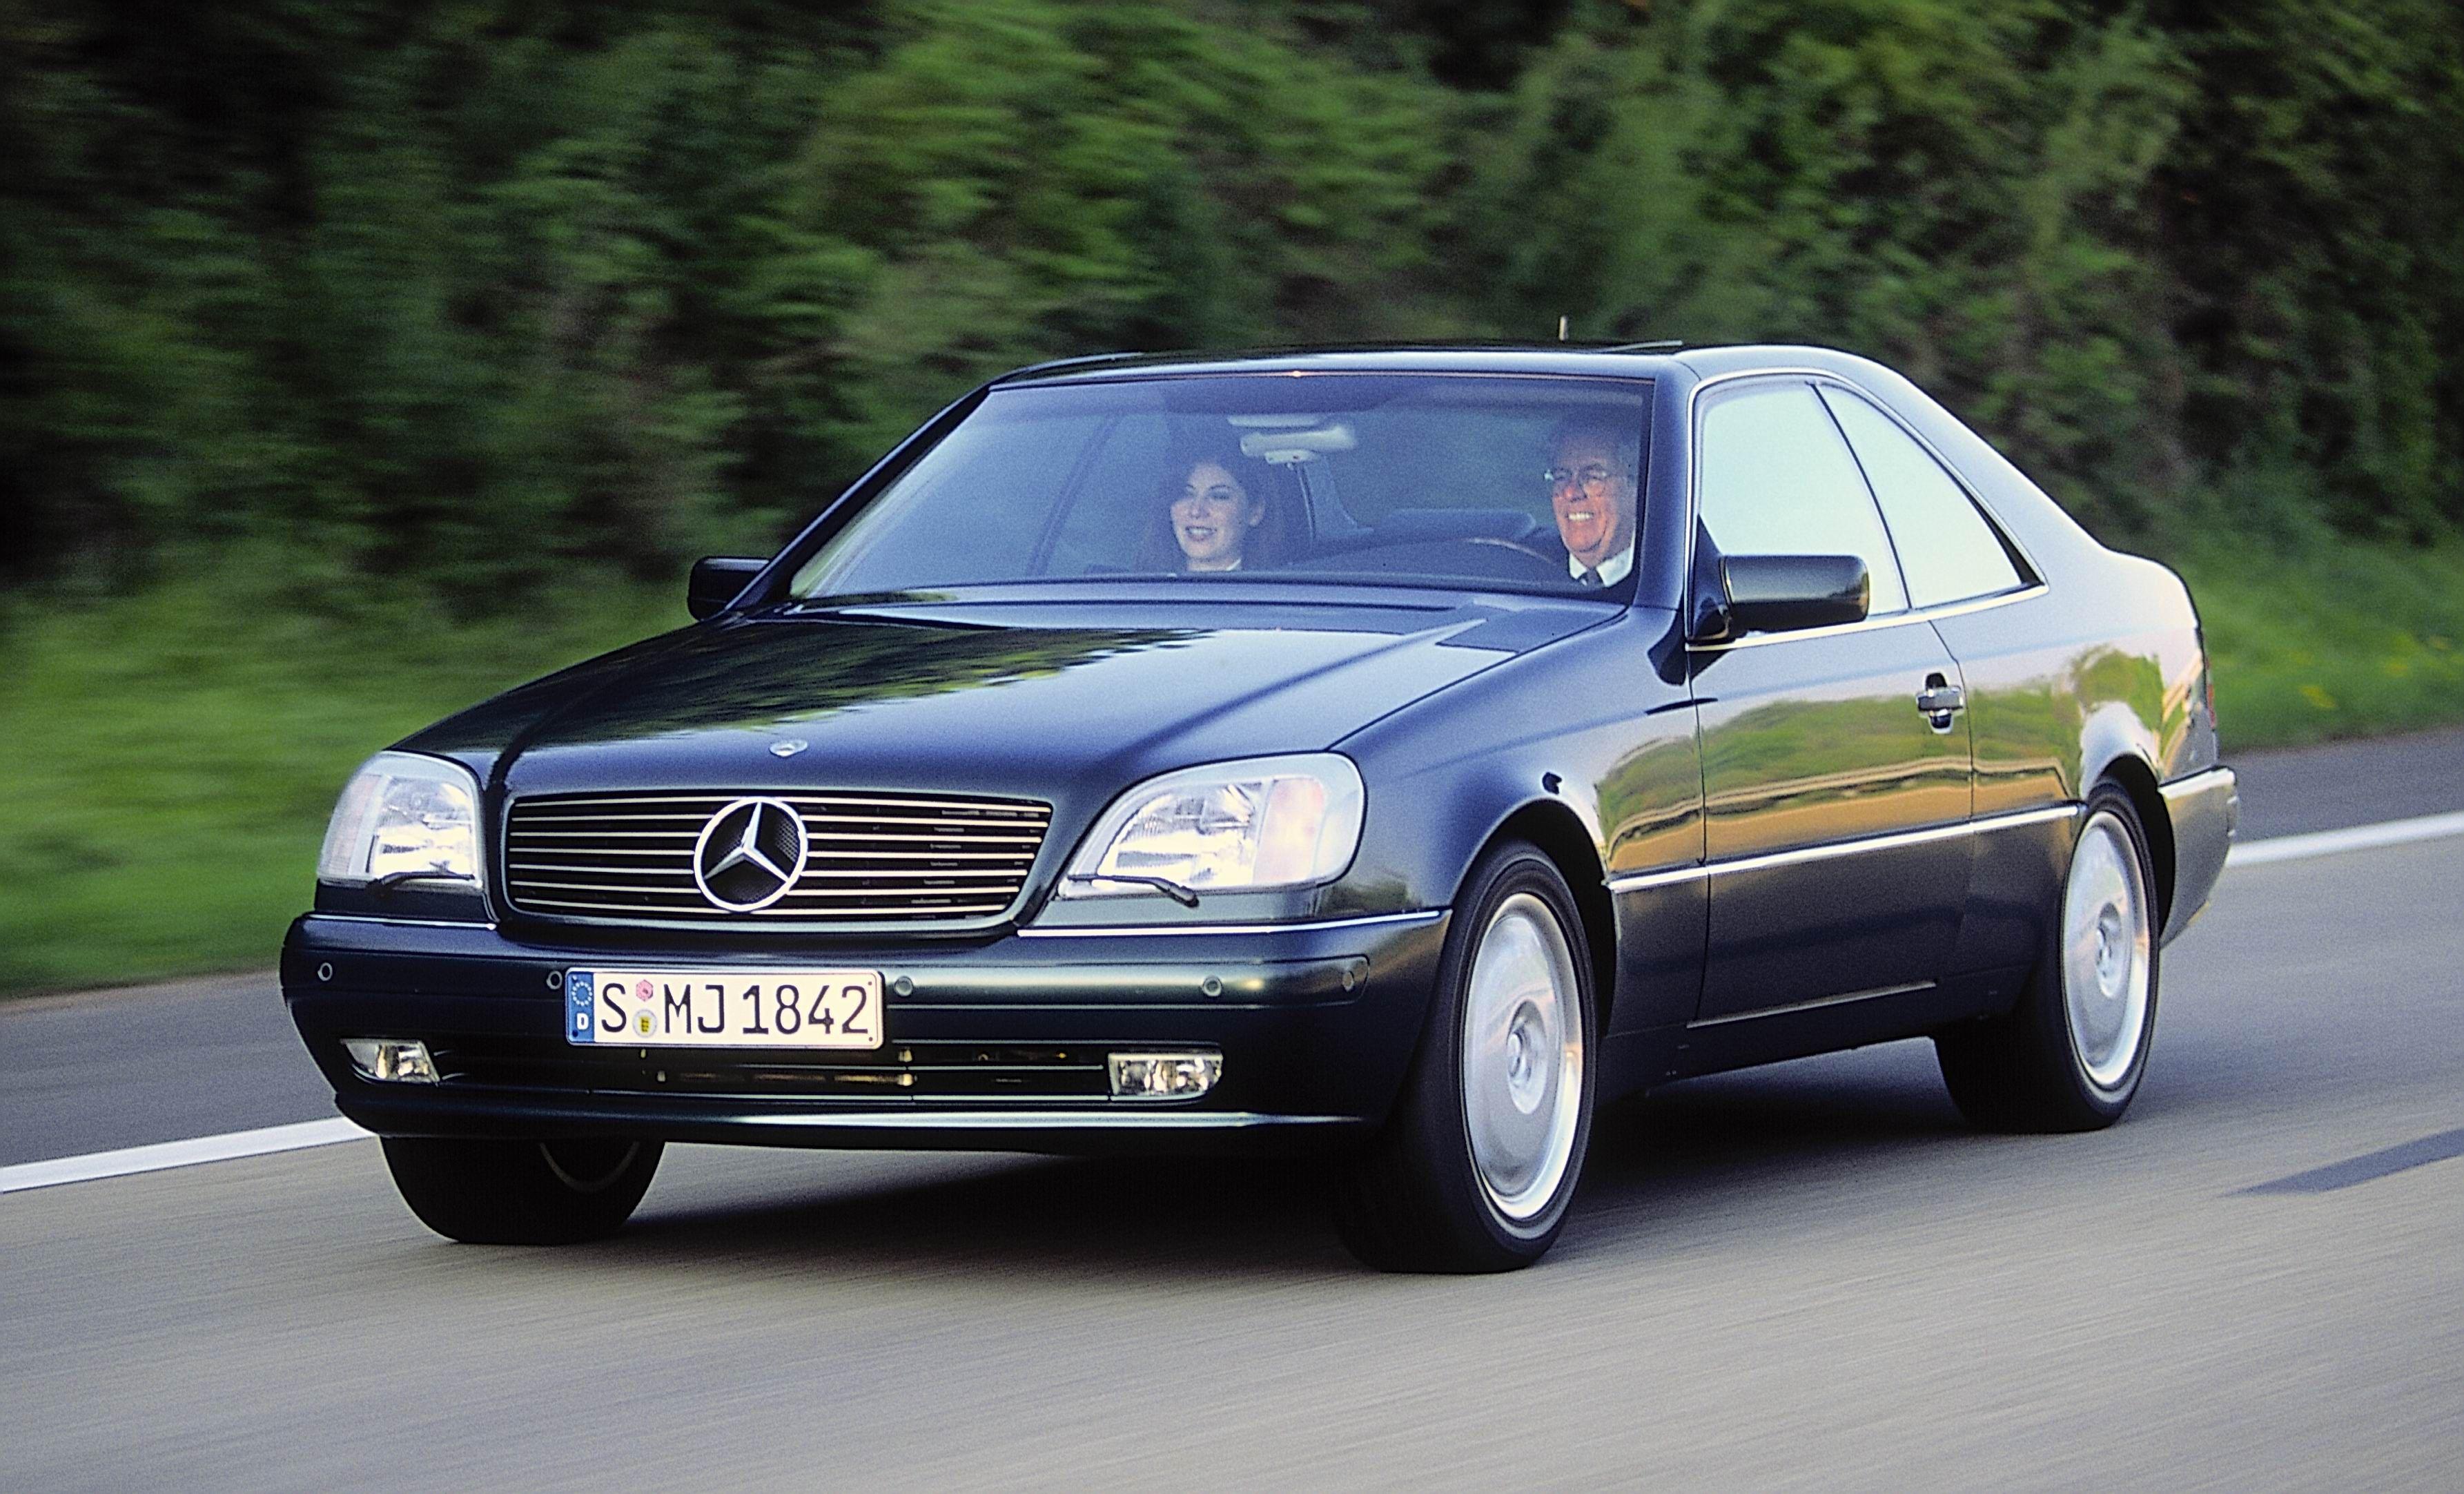 Mercedes-Benz C140 S-class coupe.